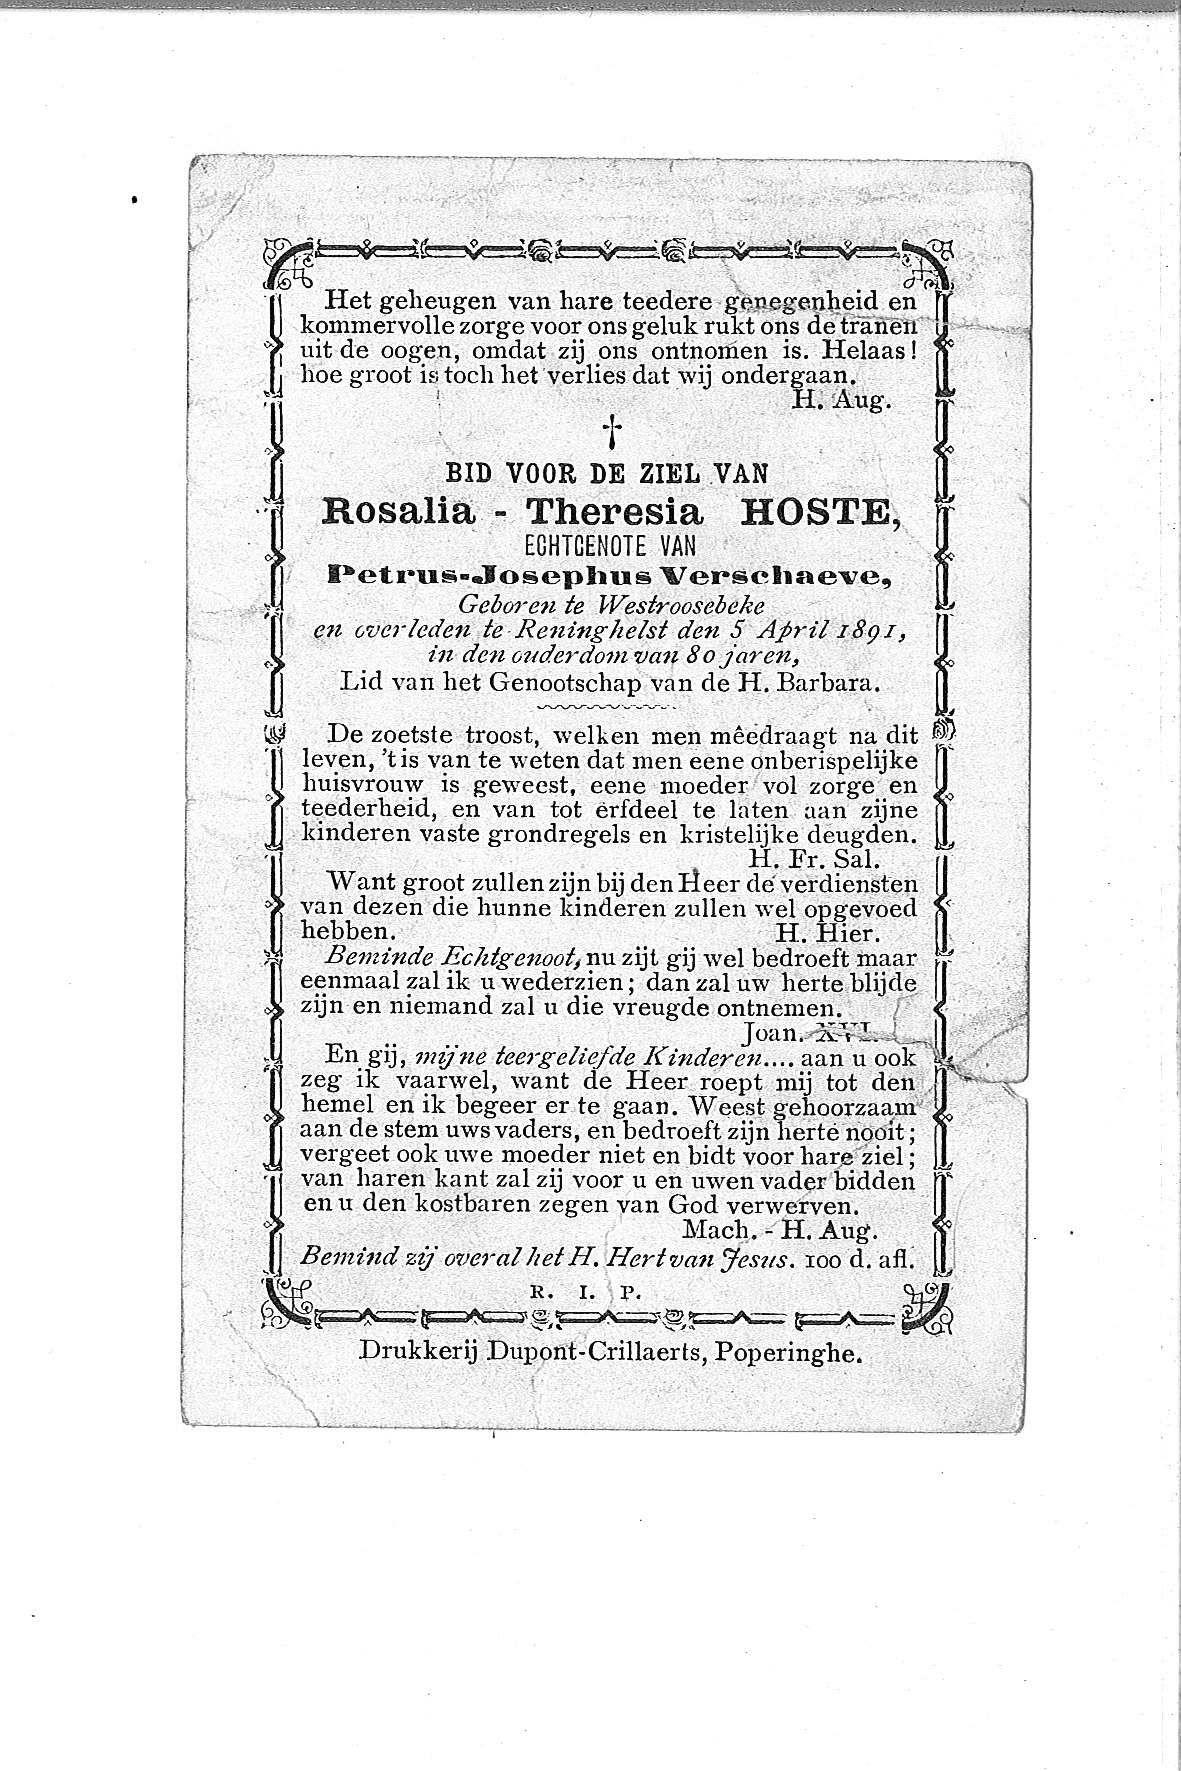 Rosalia-Theresia(1891)20120530124803_00108.jpg